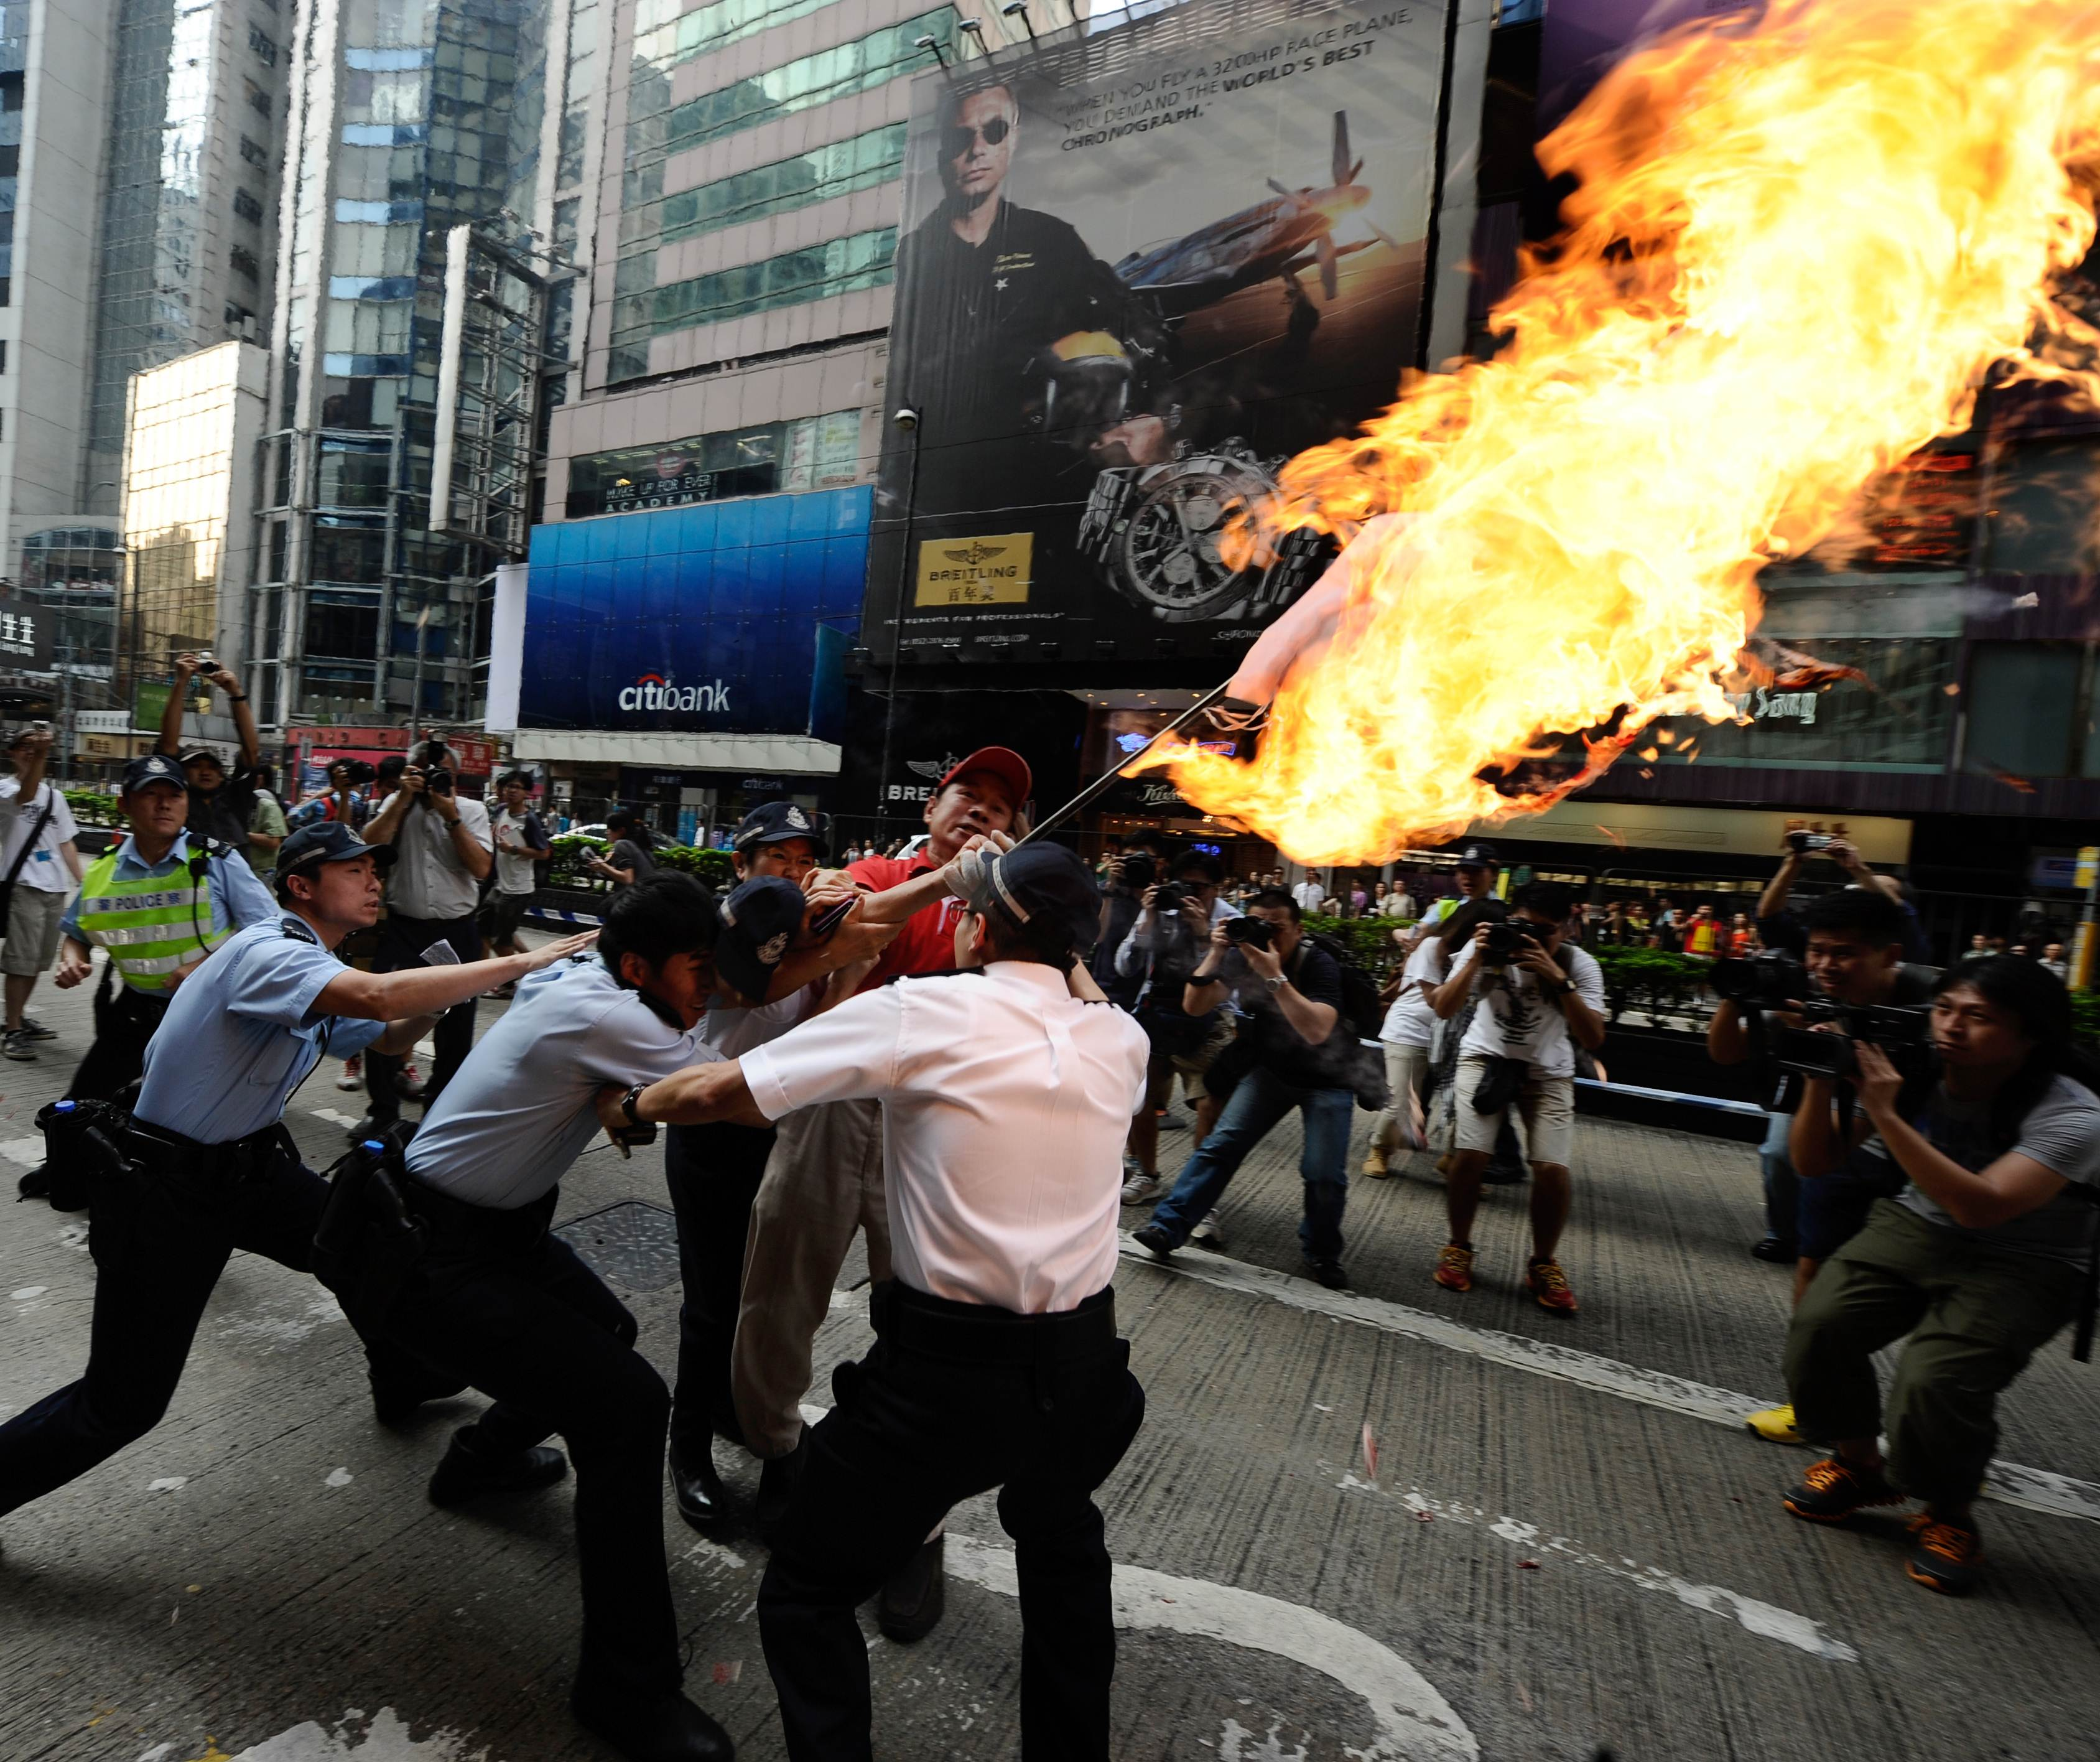 China Police: Photos: Anti-Japan Protests In China, September 16